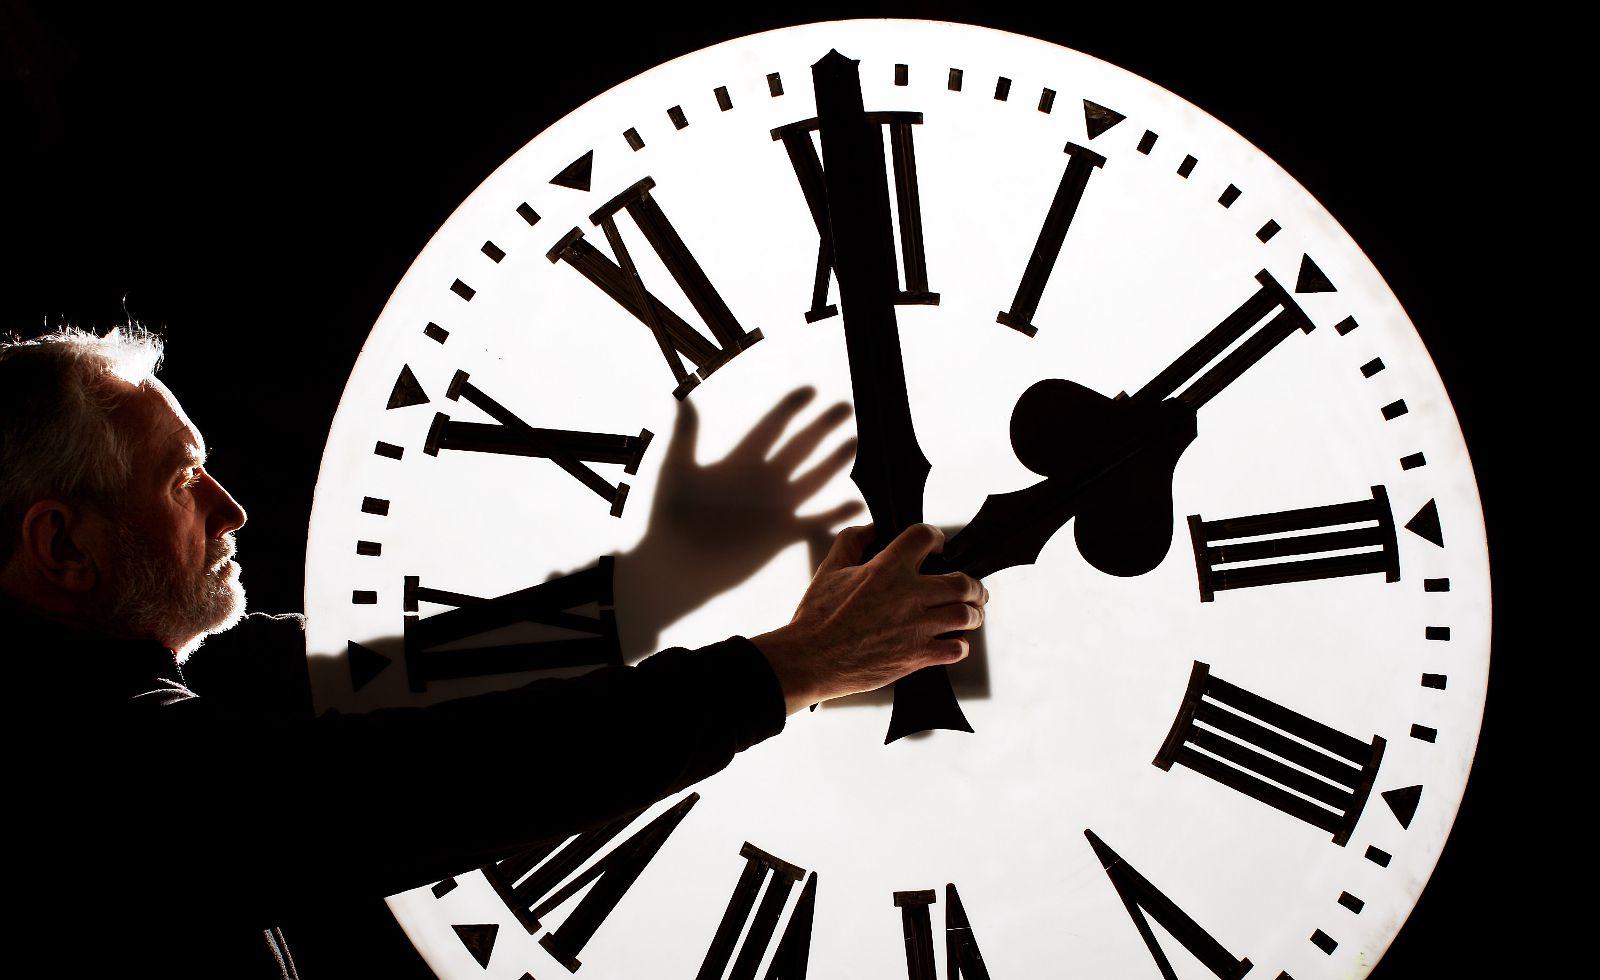 Takt Time: Saiba o que é e como calcular